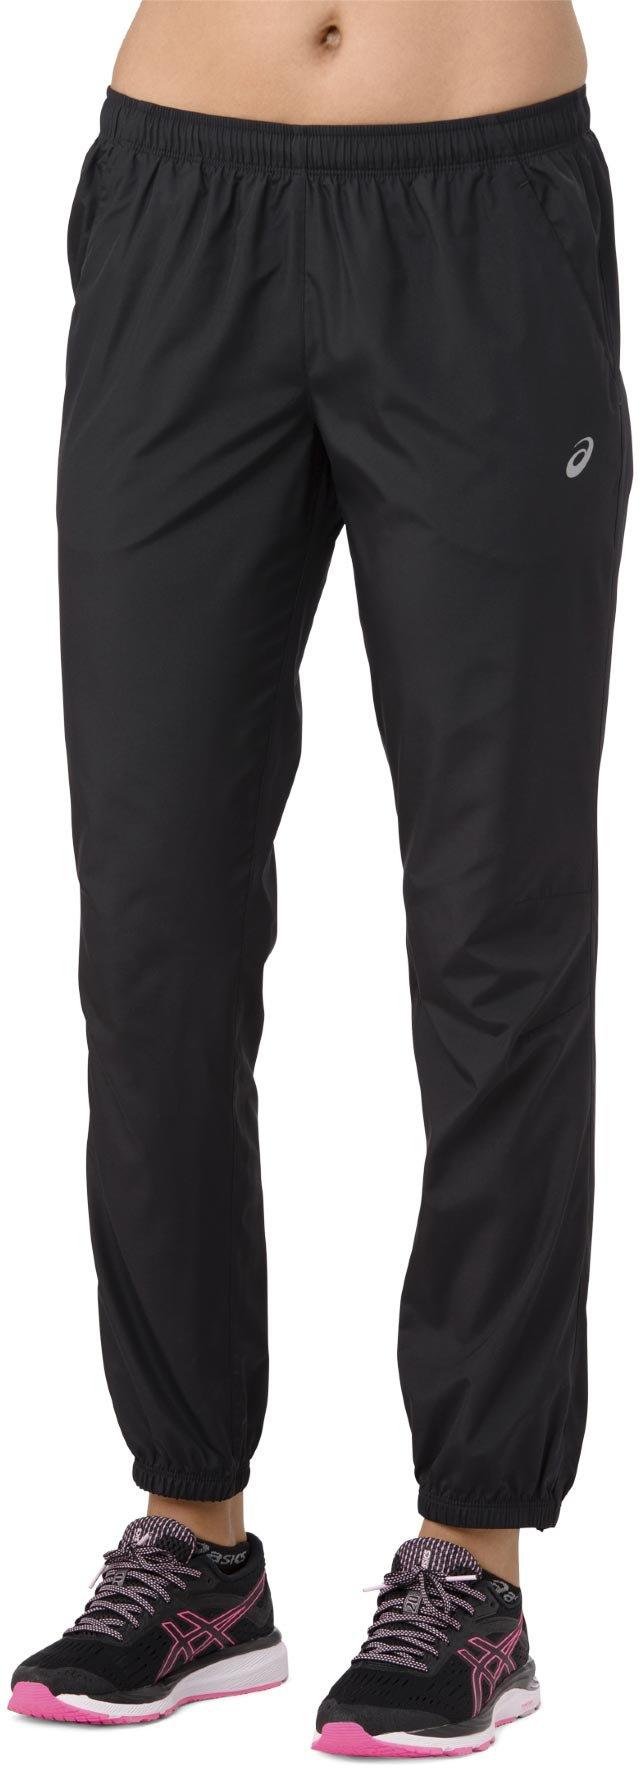 Asics Silver Woven Pant L